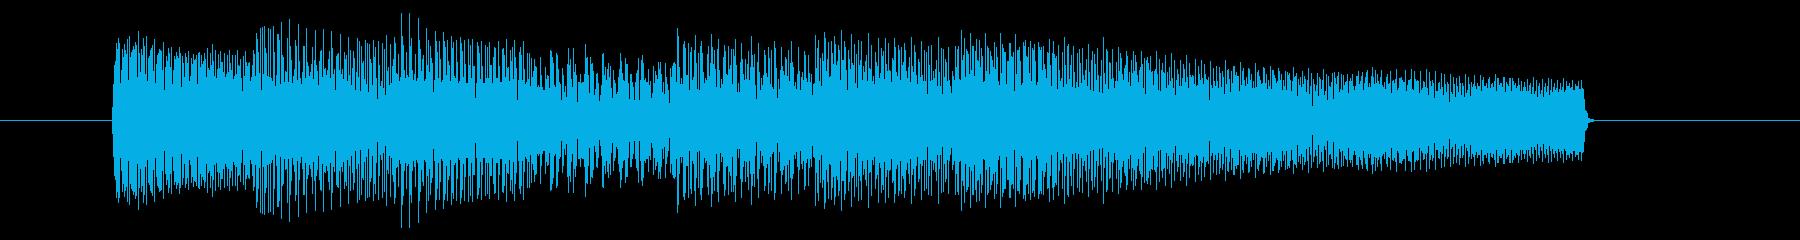 NES 汎用 C06-2(クリア2)の再生済みの波形